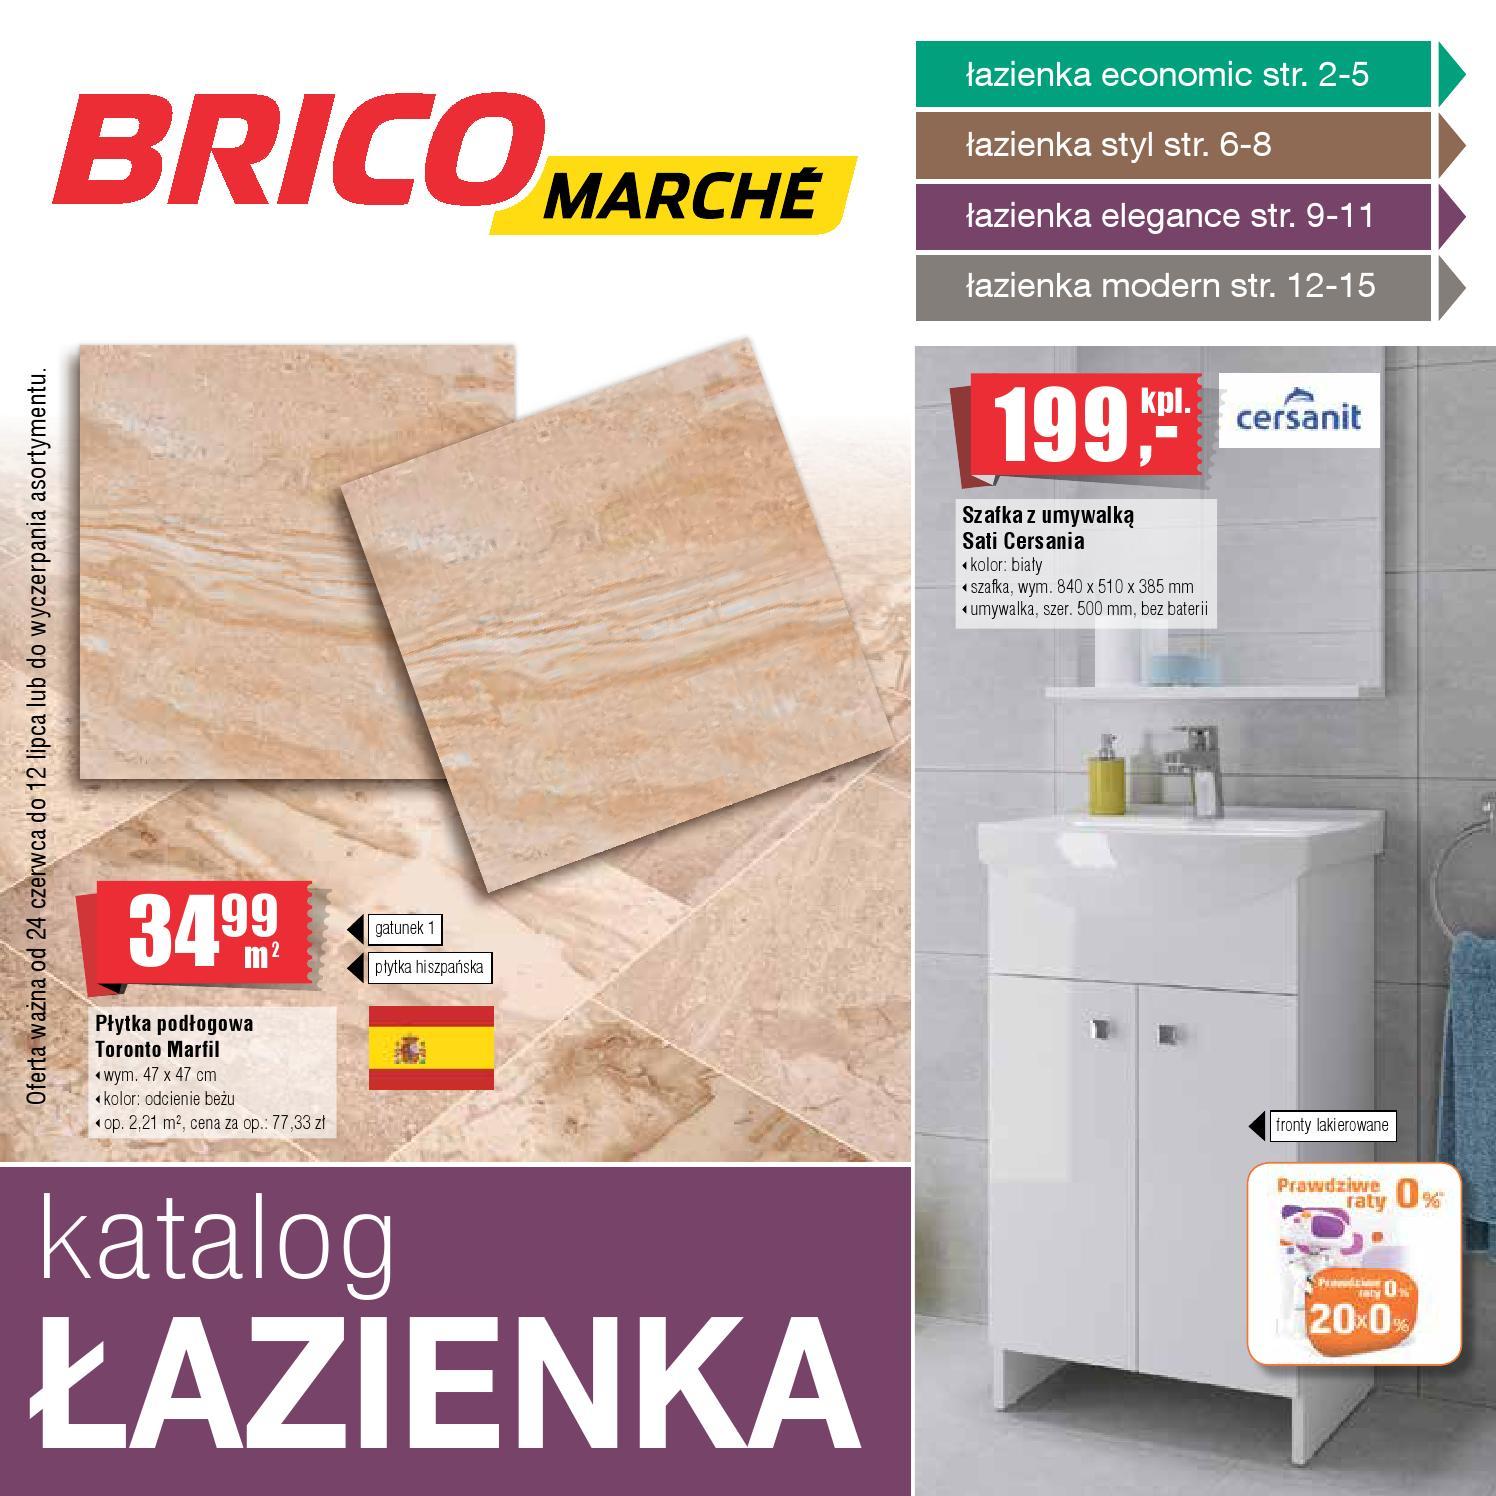 Bricomarche Katalog Lazienka 24 06 12 07 By Finmarket Issuu